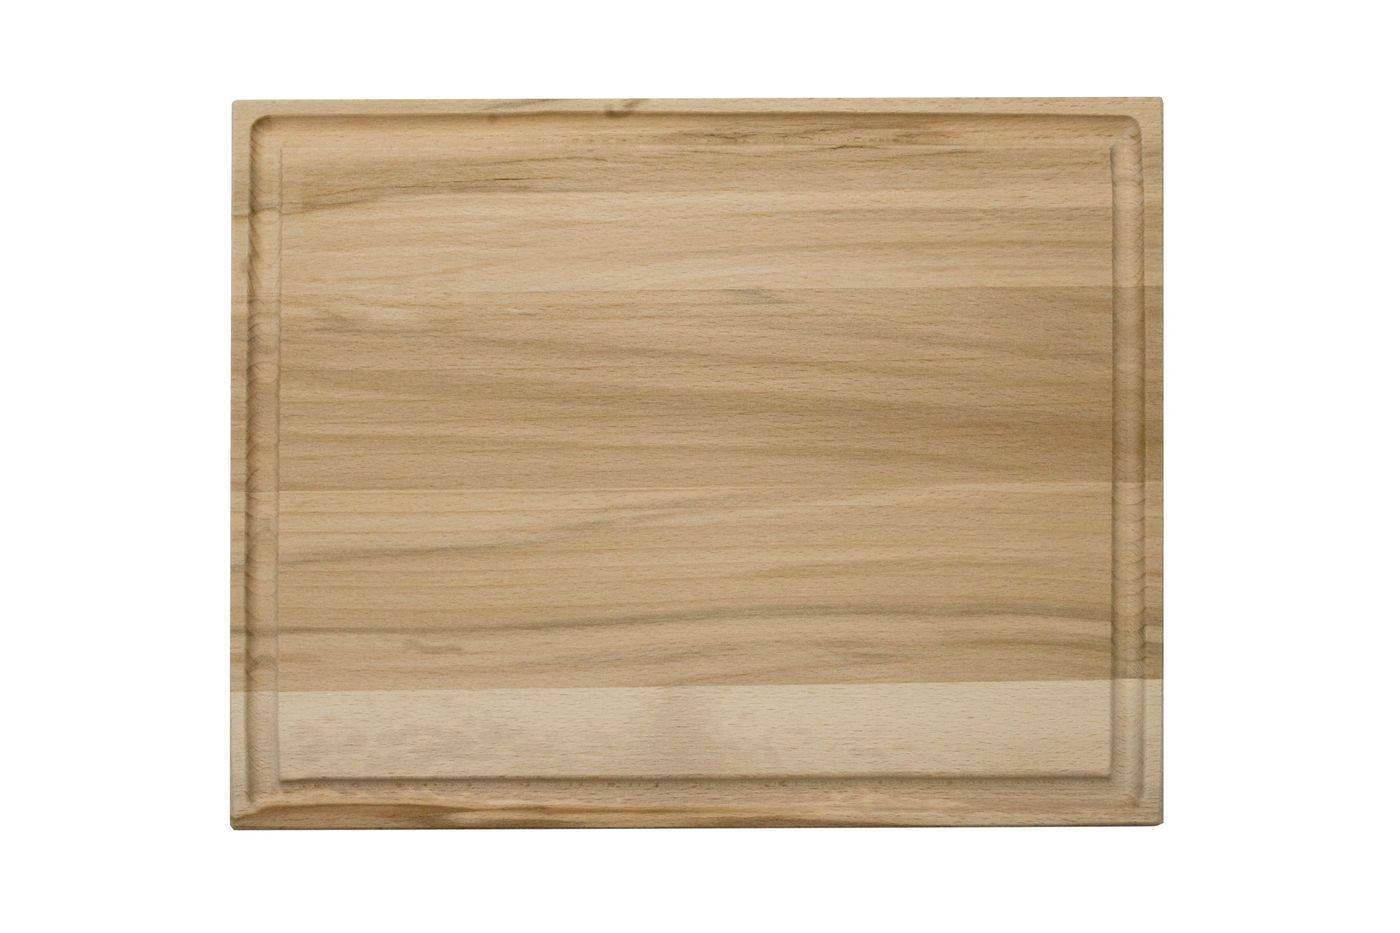 Deska na maso s drážkou, 300 x 200 x 20 mm - Dřevovýroba Otradov